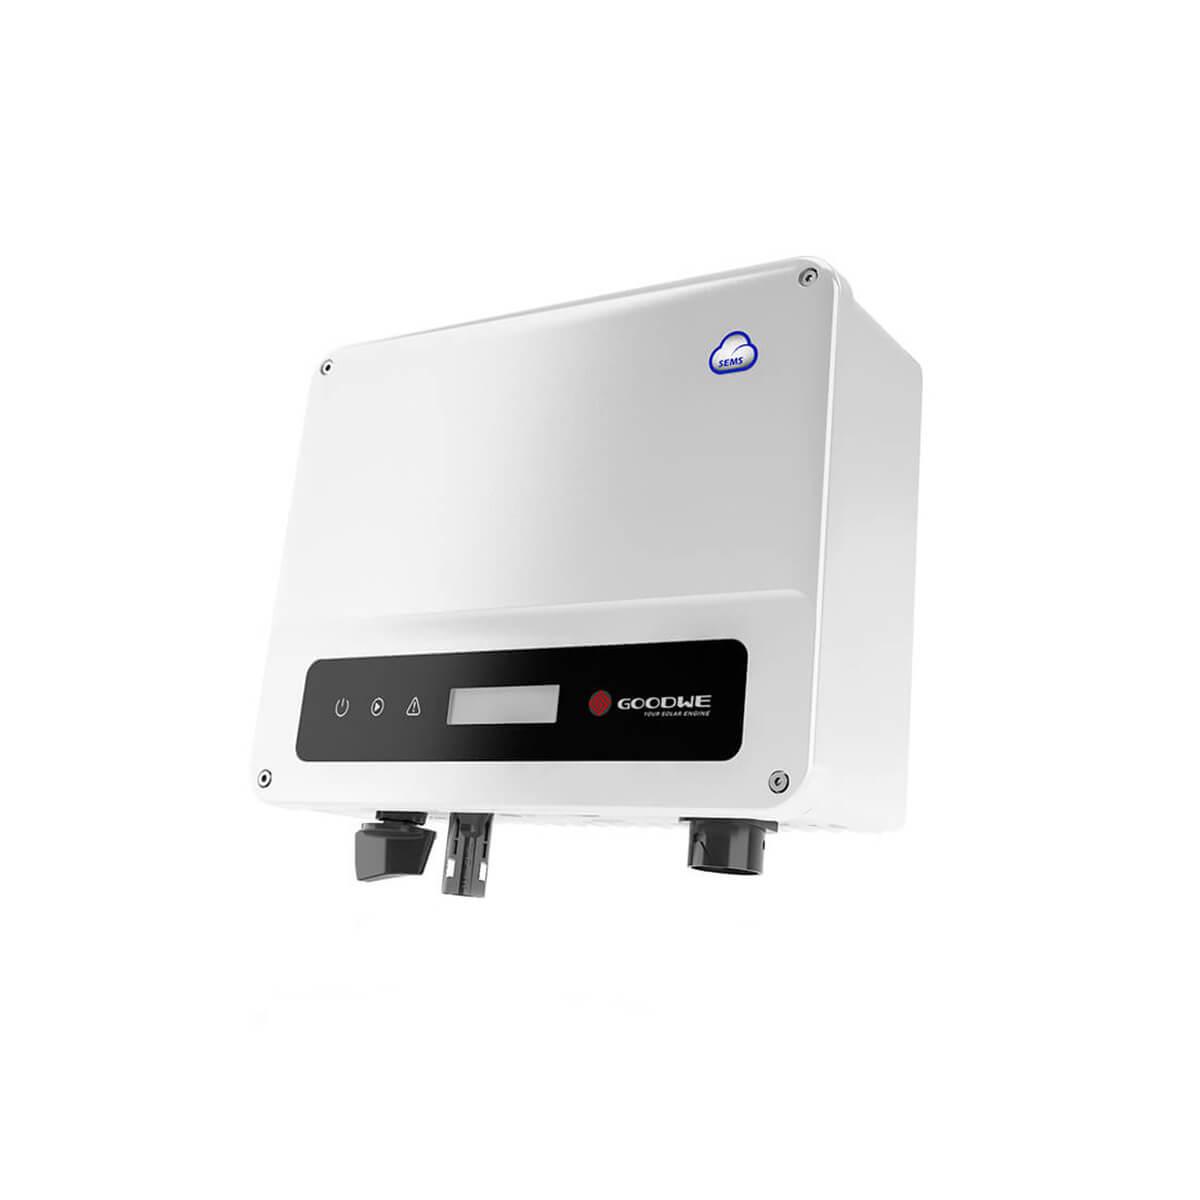 goodwe 3kW inverter, goodwe gw3000-xs 3kW inverter, goodwe gw3000-xs inverter, goodwe gw3000-xs, goodwe 3 kW